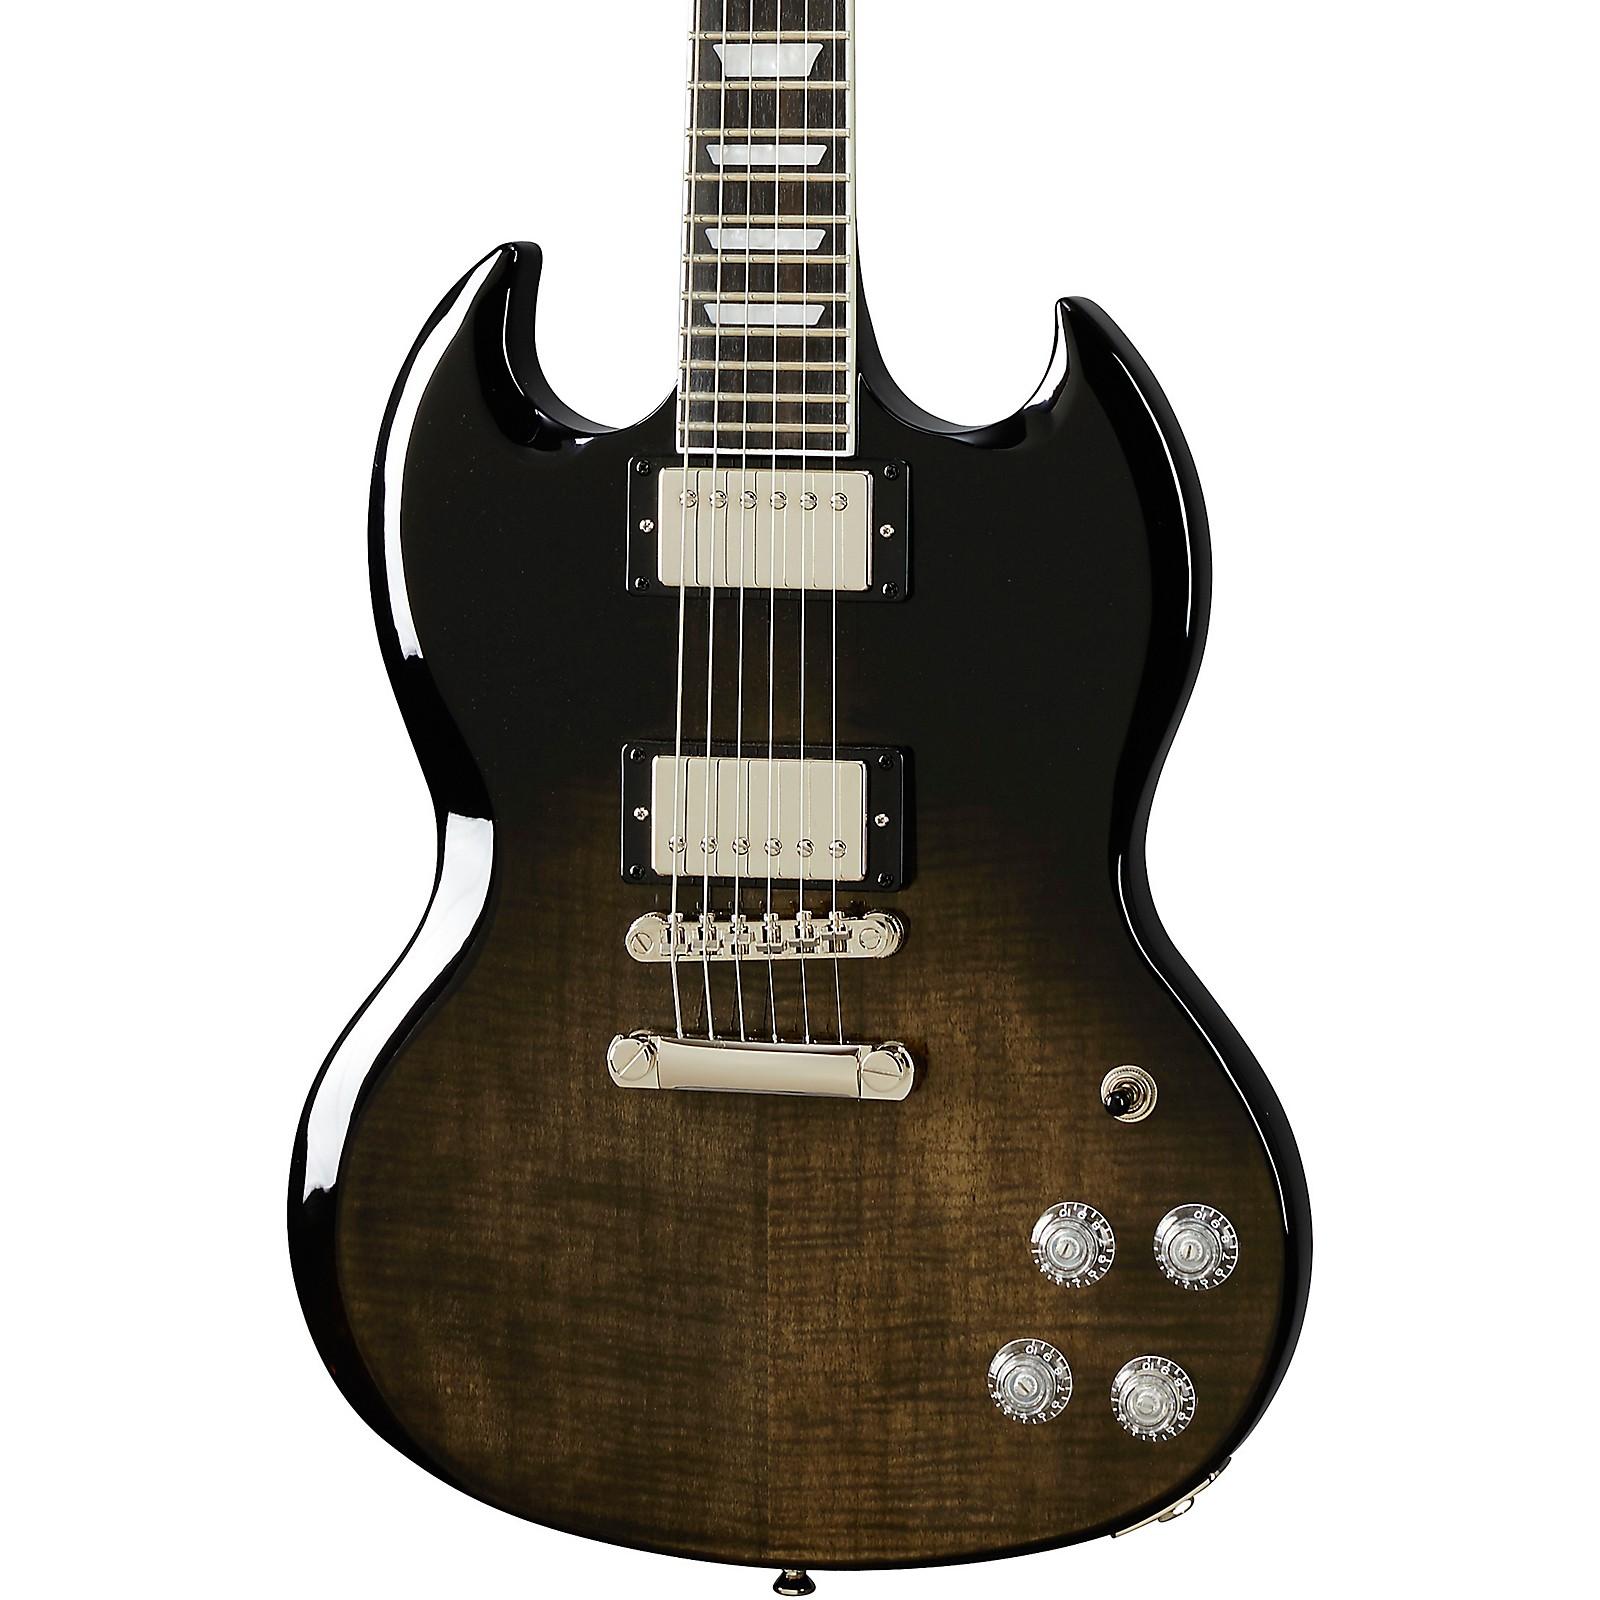 Epiphone SG Modern Figured Solidbody Electric Guitar